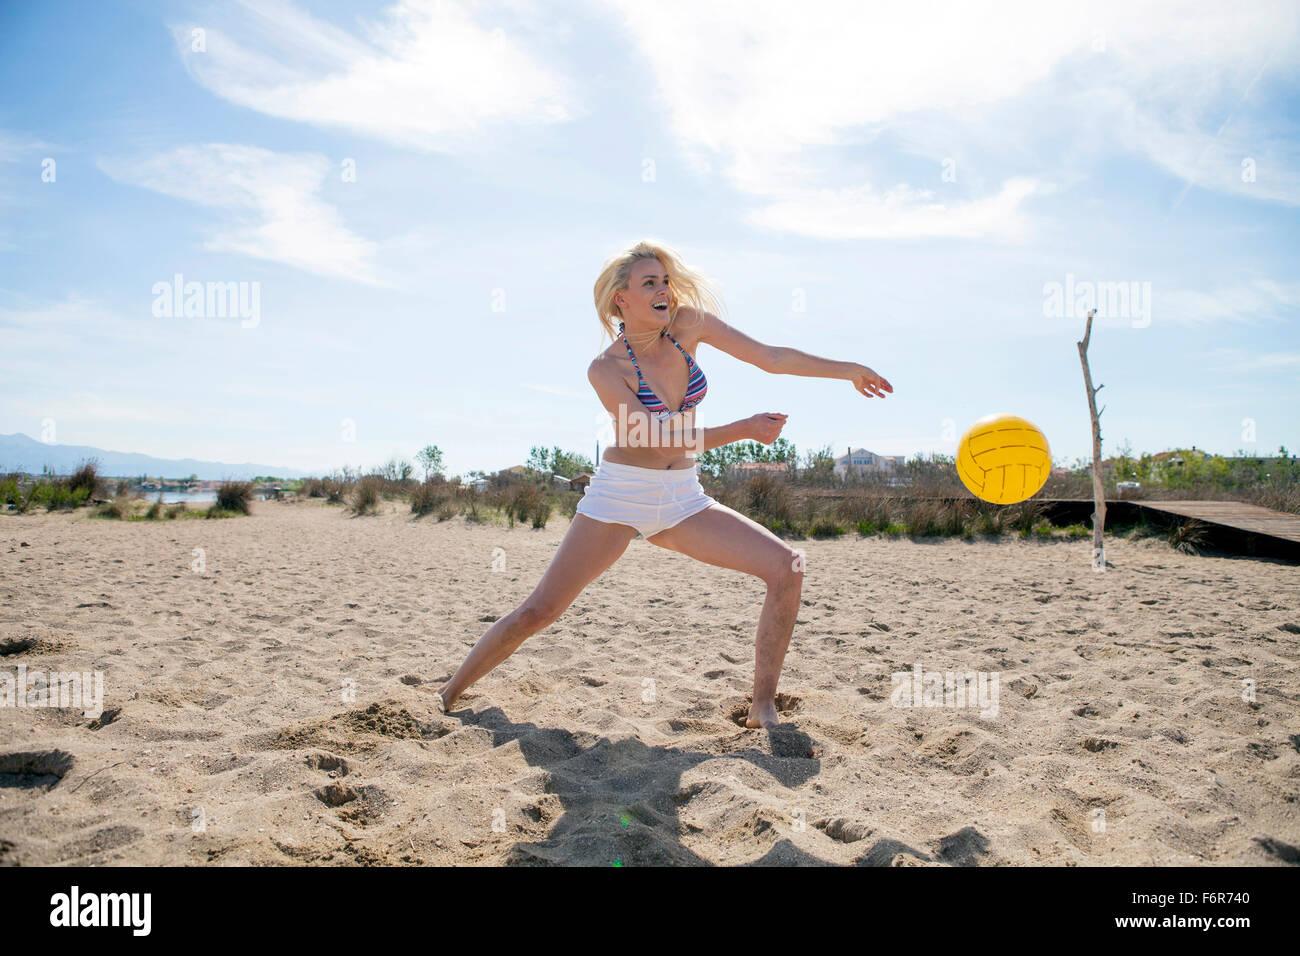 Junge Frau spielen Beach-volleyball Stockbild